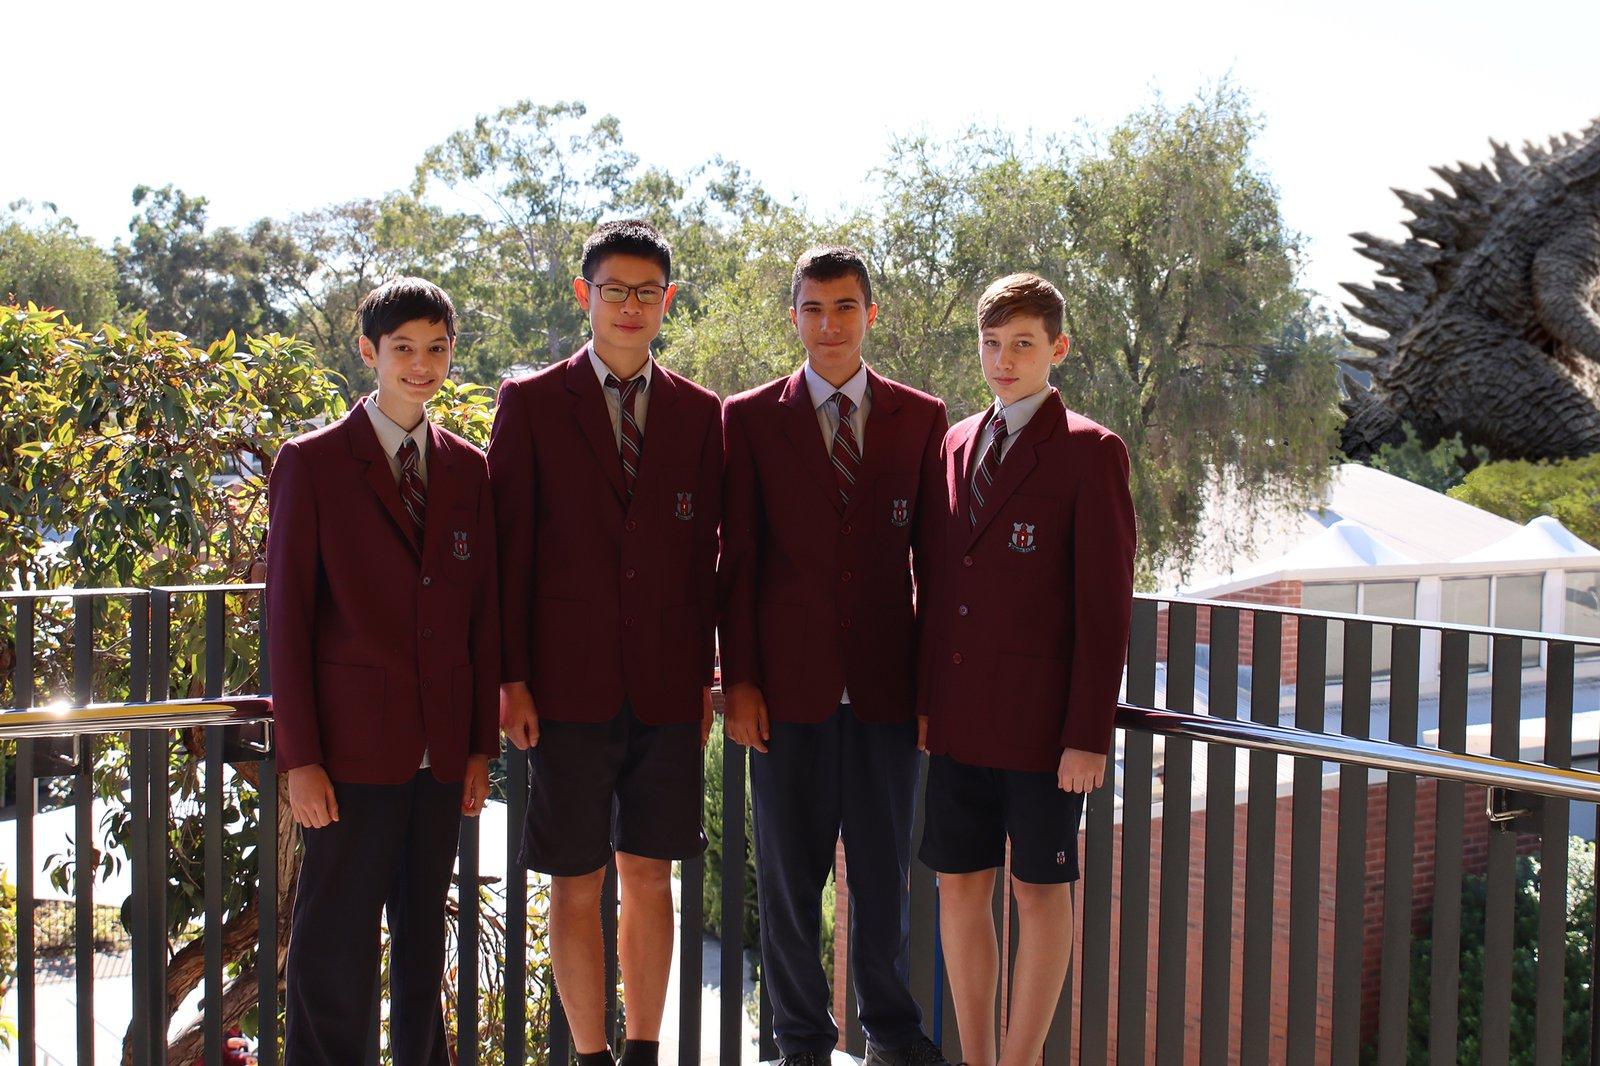 Isaac N., Ethan P., Reuben R. and Alex S., Willetton Senior High School, WA